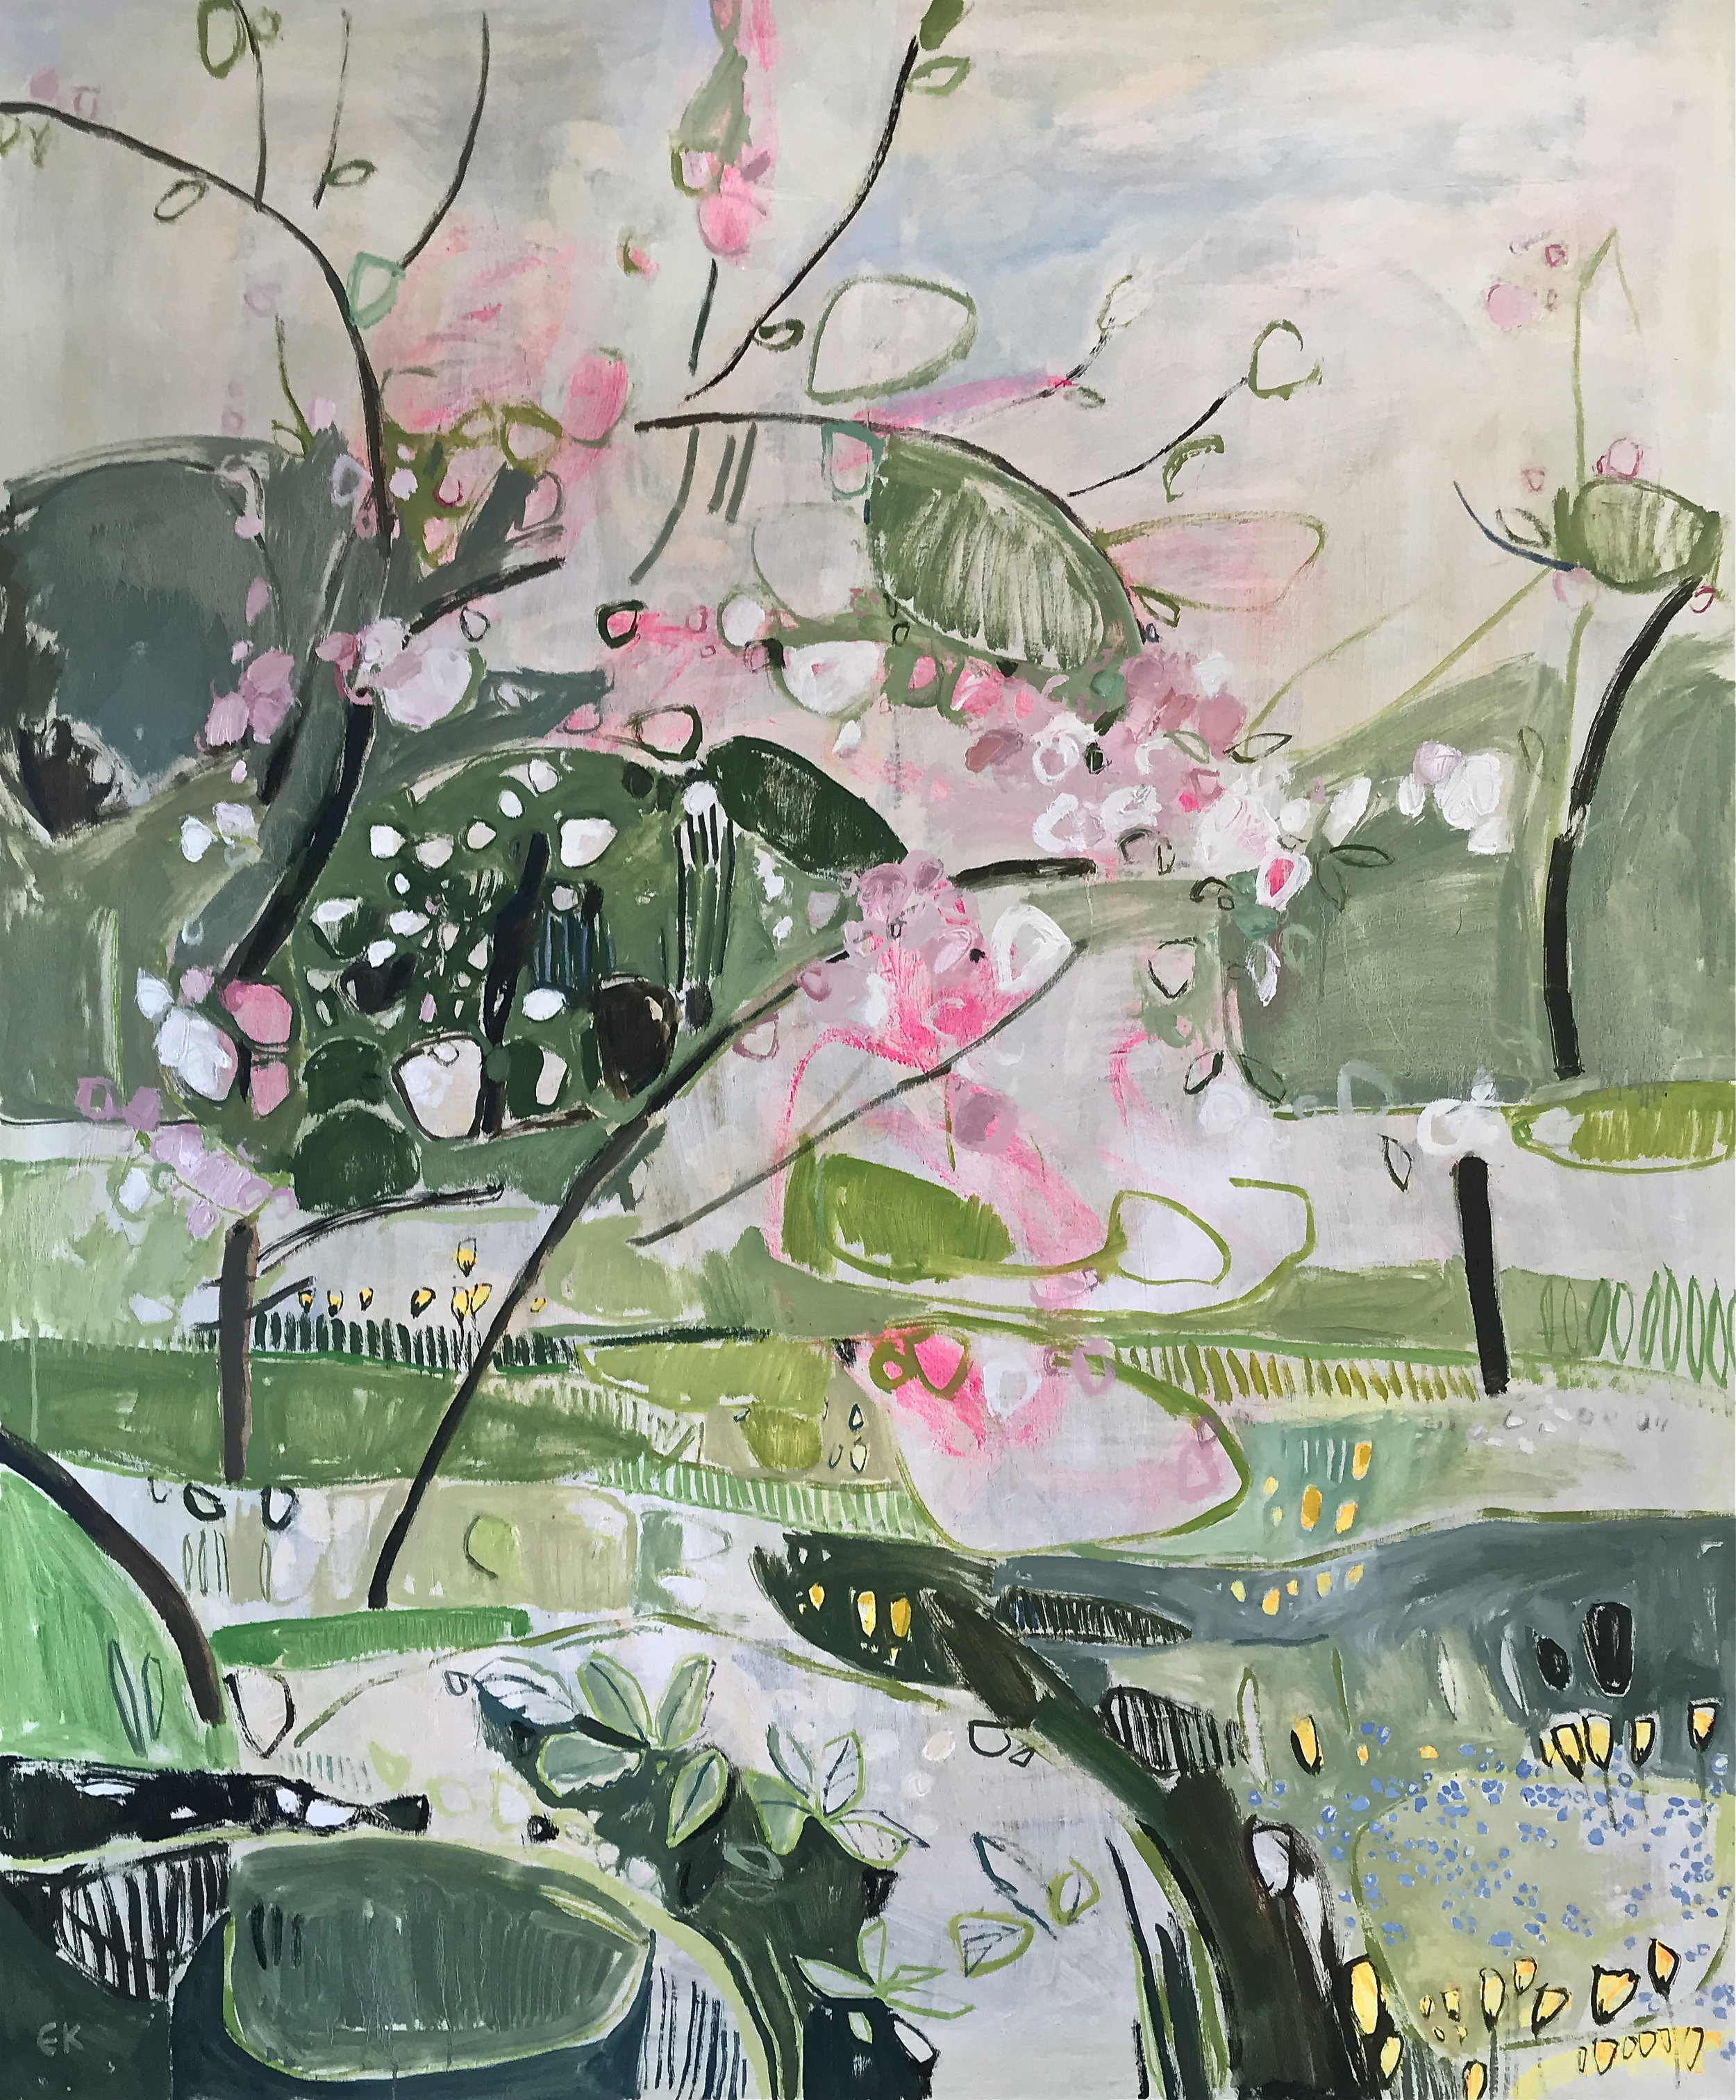 Apple Blossom at Botley Lane Allotments, (Twenty Pound Meadow) Oxford II